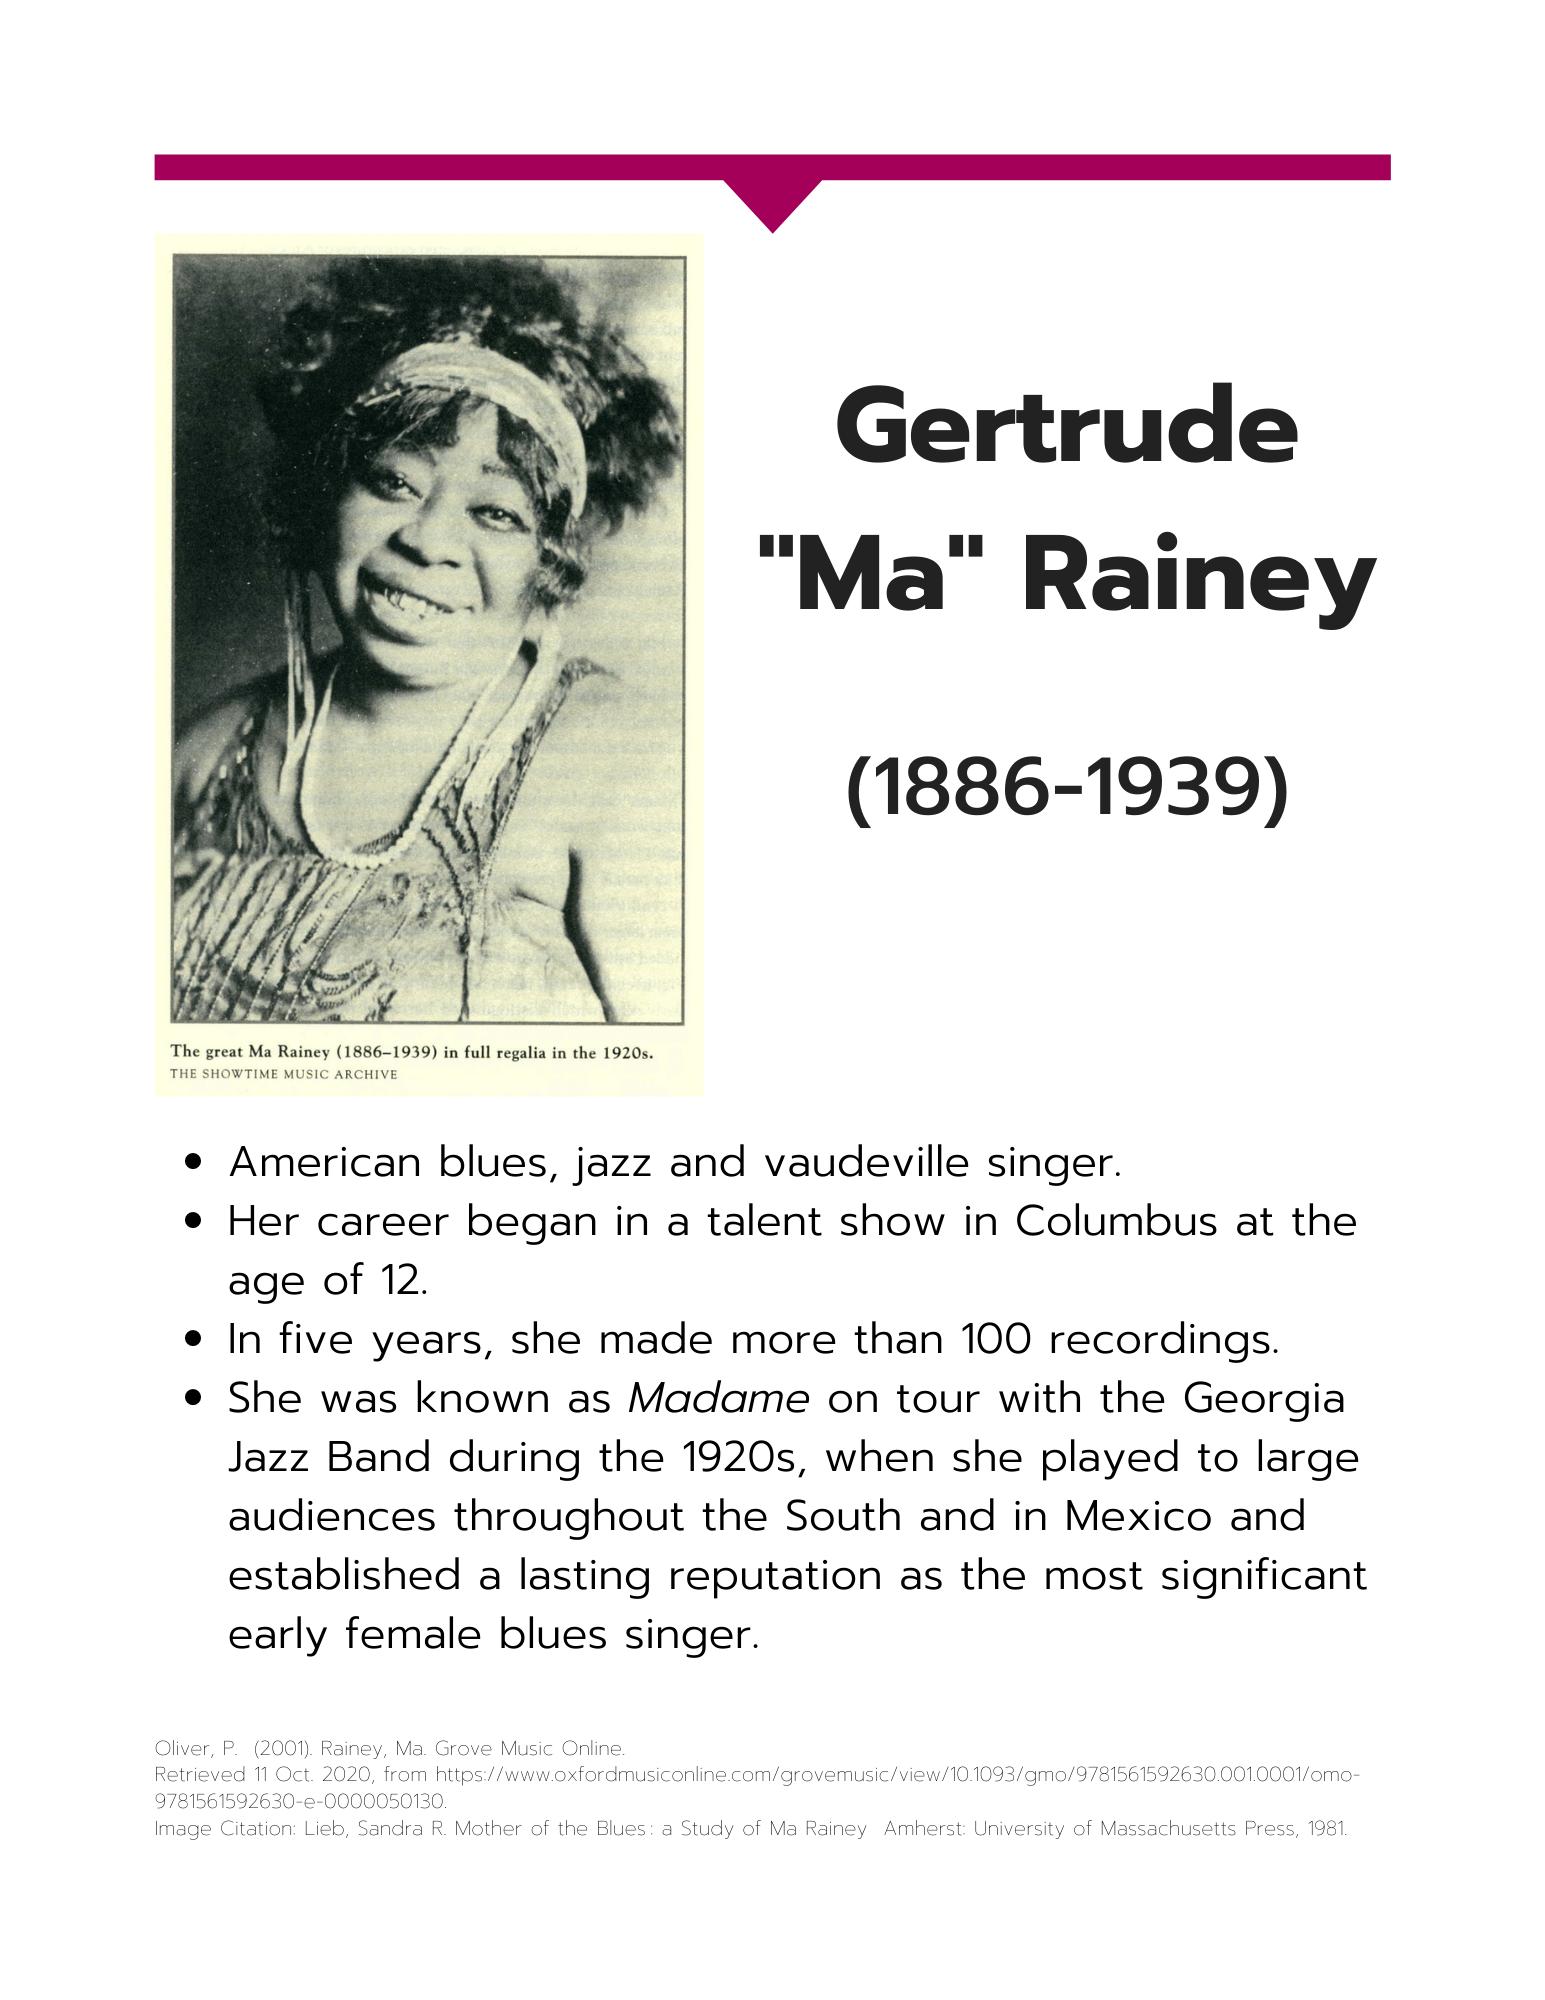 Gertude Ma Rainey information sheet art